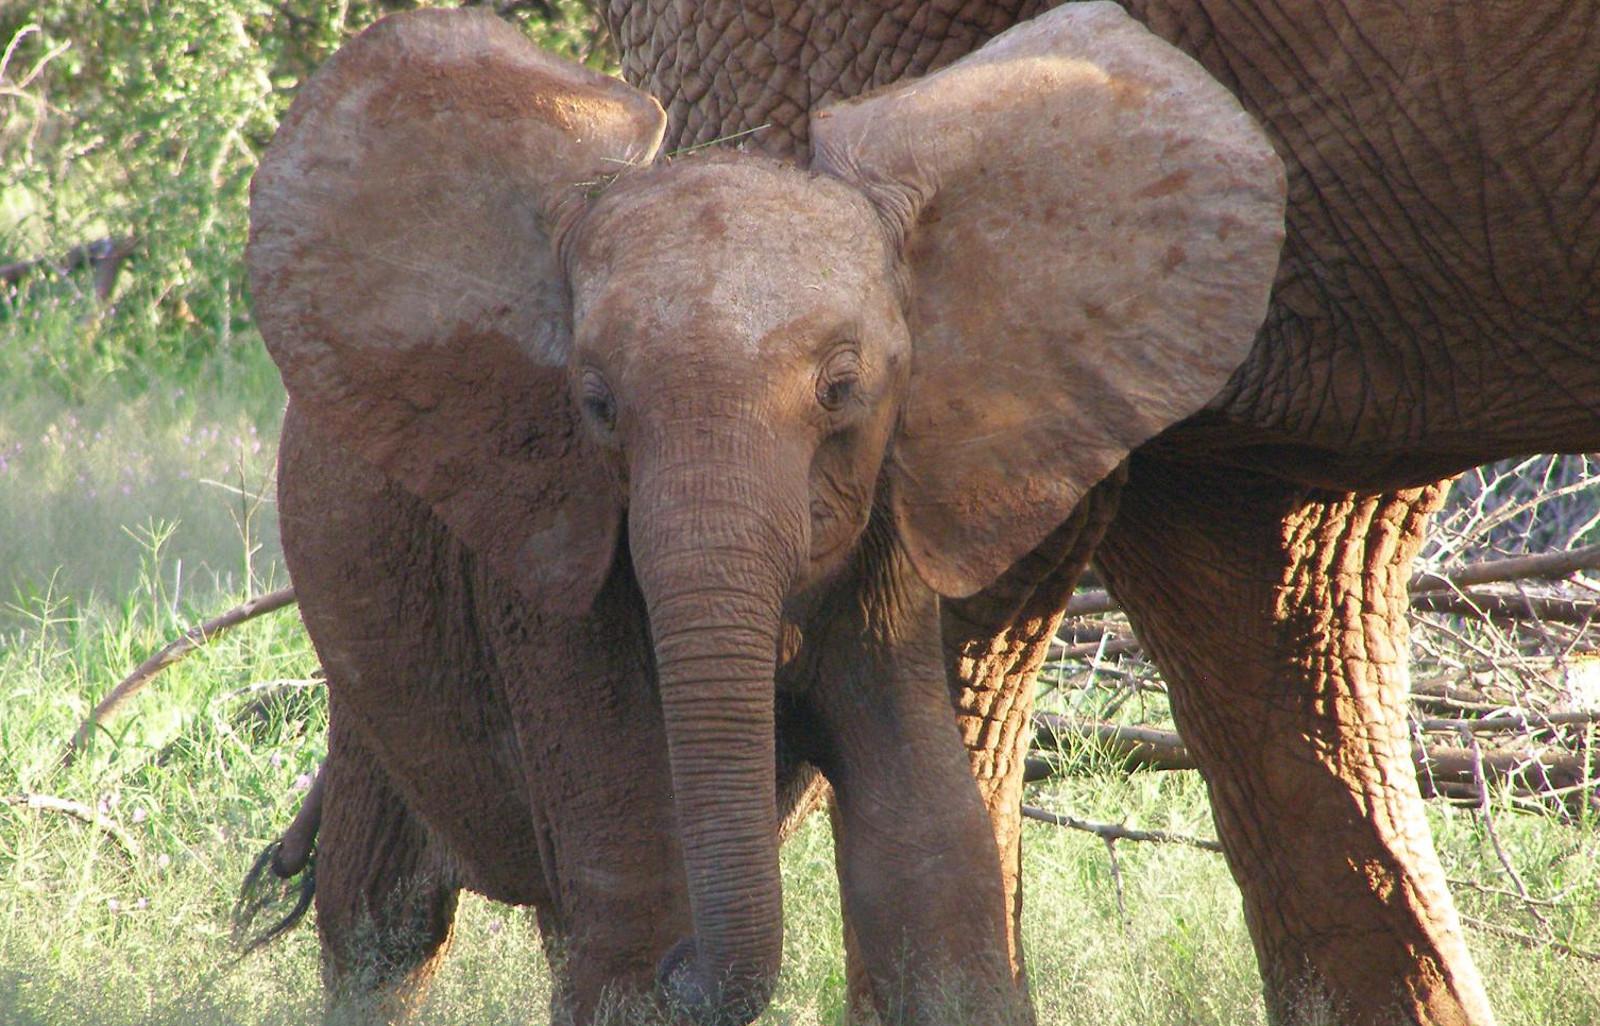 Captured Baby Elephants From Zimbabwe Sent to China to be Put in Captivity